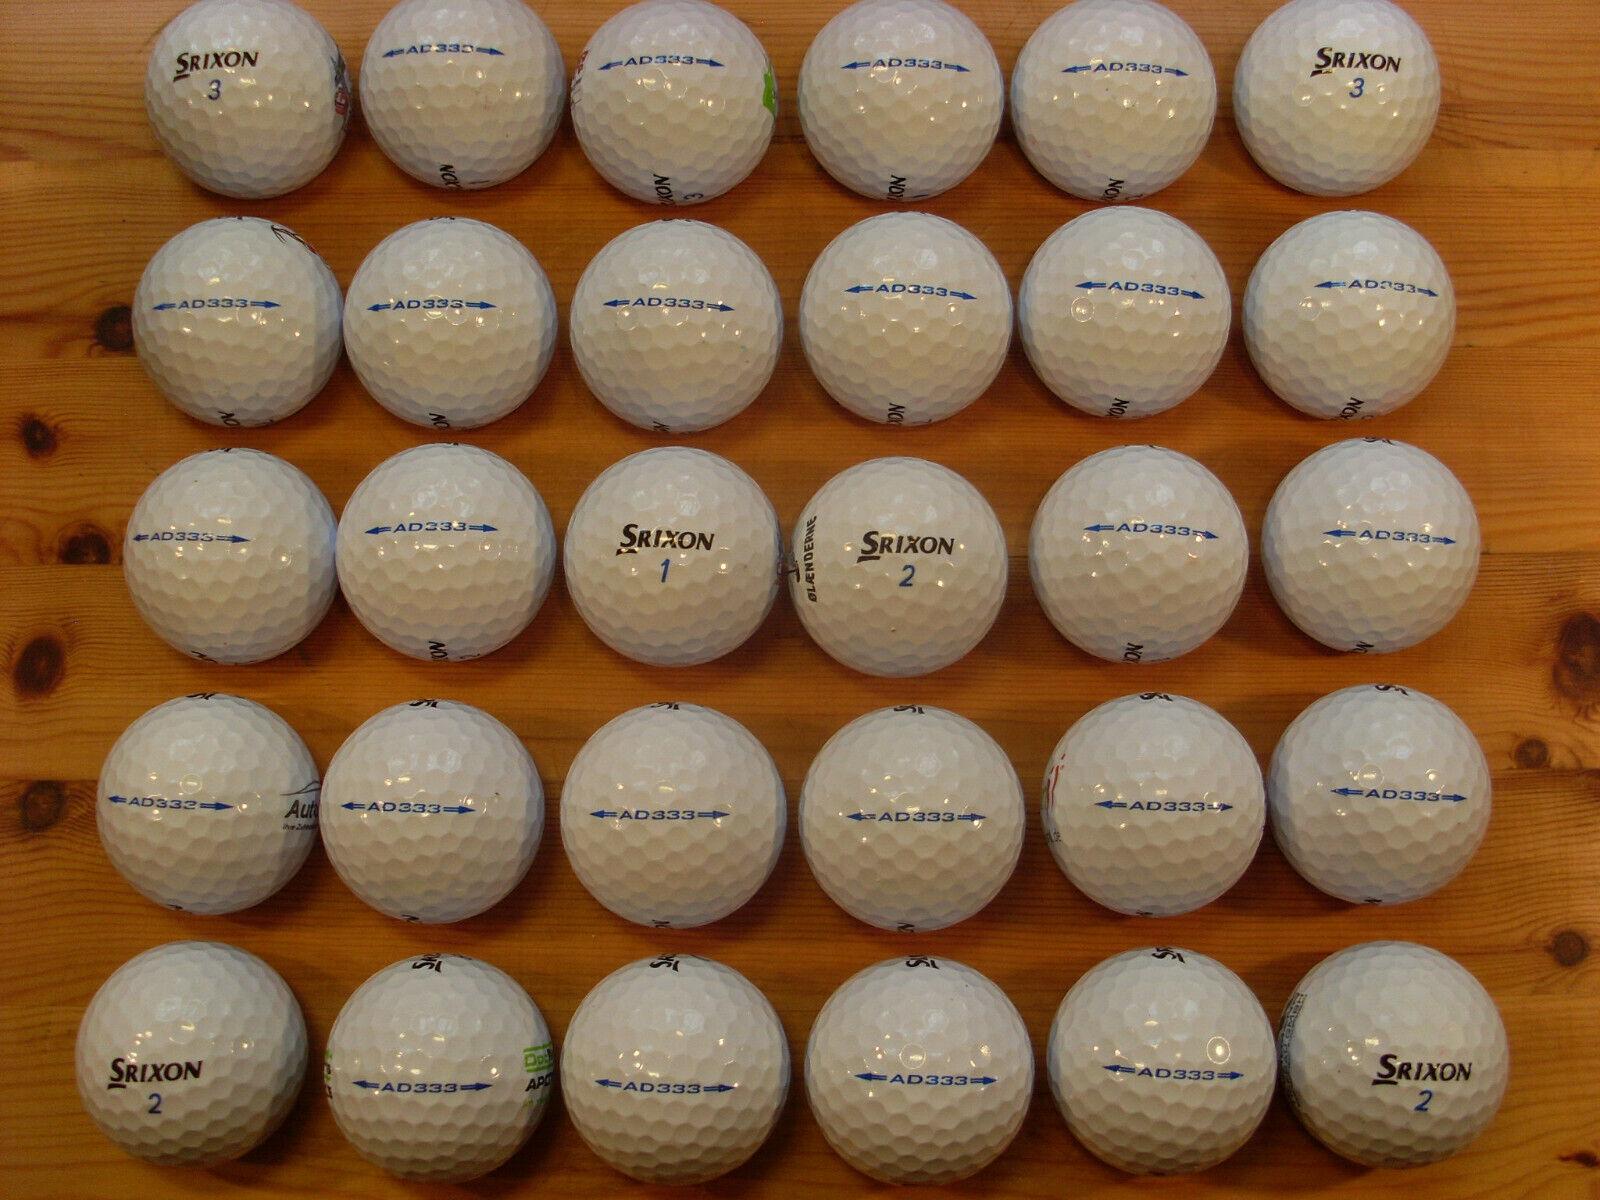 30 SRIXON AD333 gebrauchte Golfbälle Lakeballs